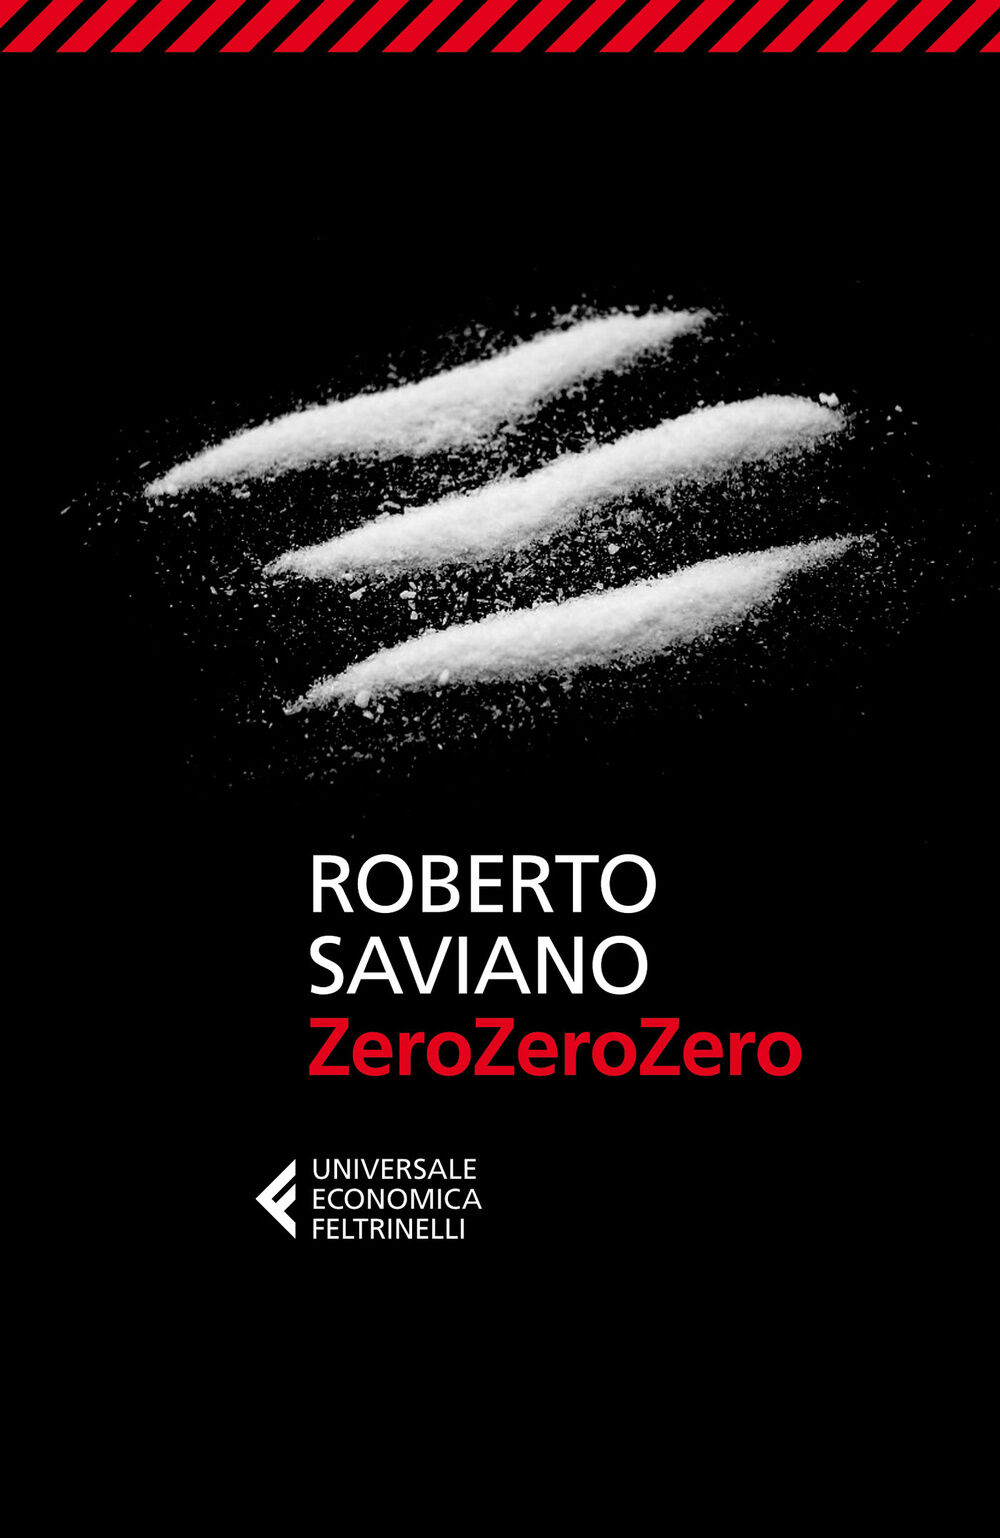 Zerozerozero Autore Roberto Saviano